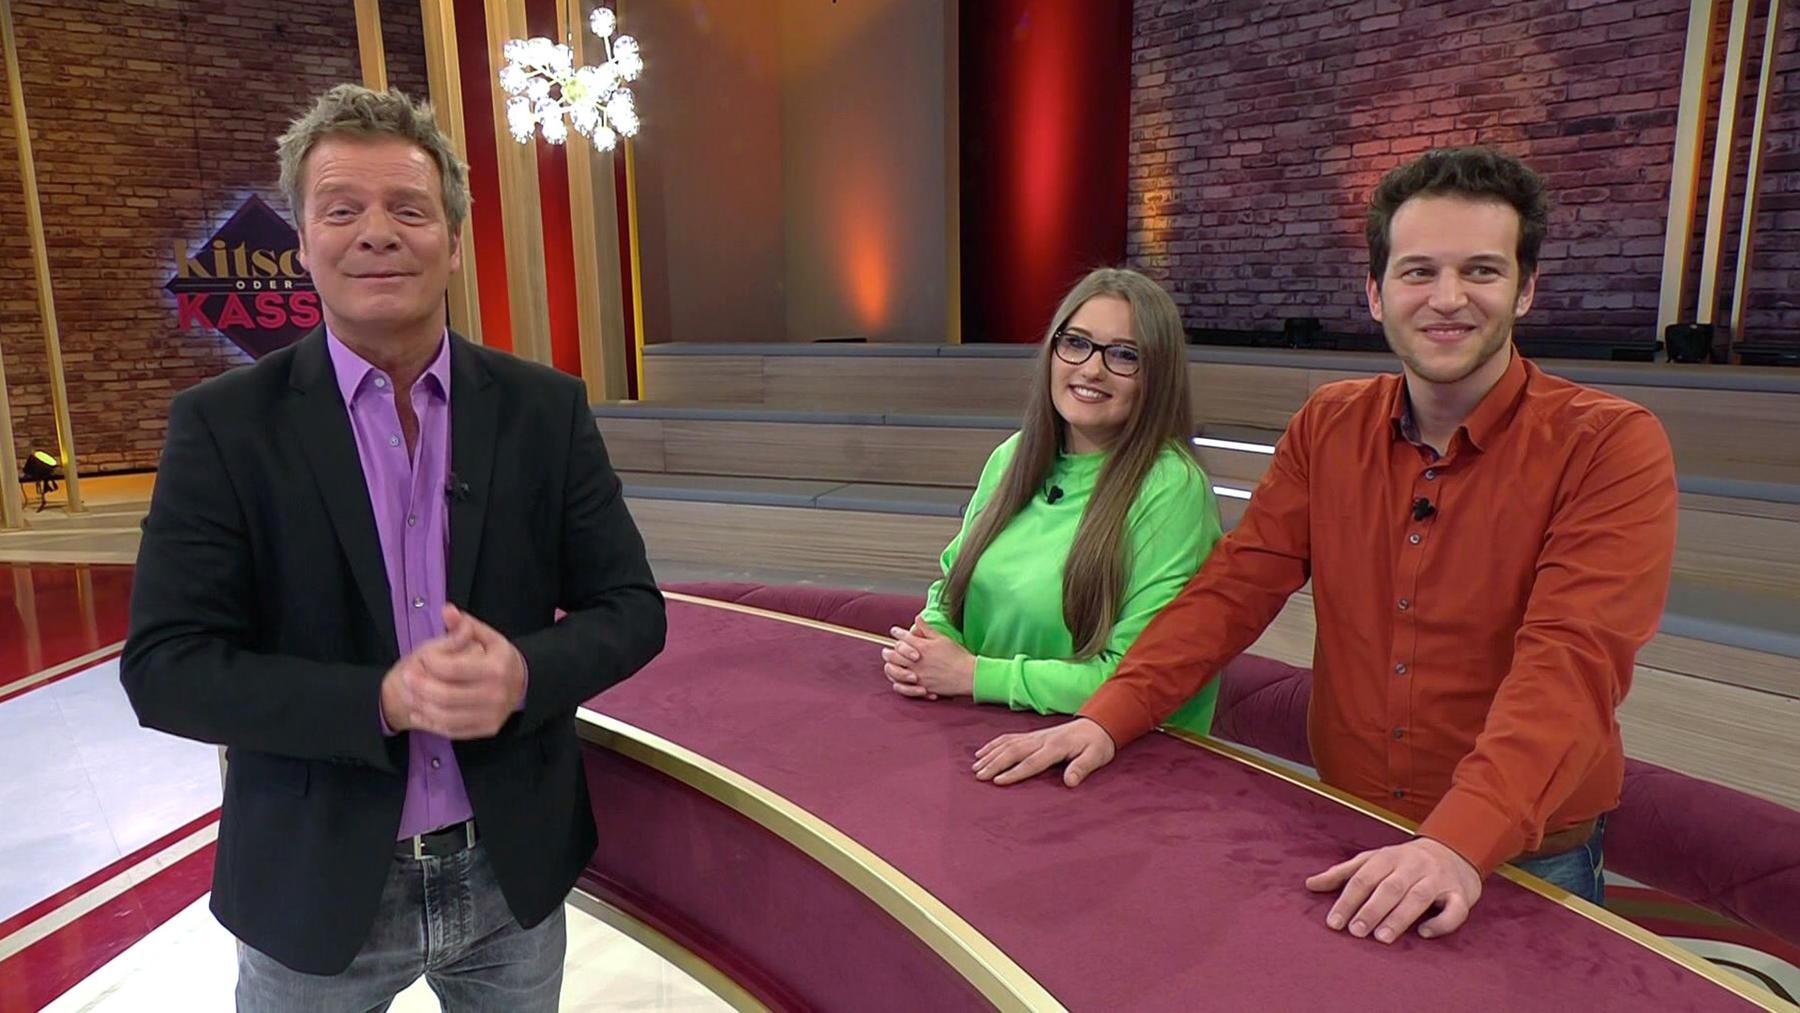 Kandidatenpaar Vicki & Rocco / Experte Mauro